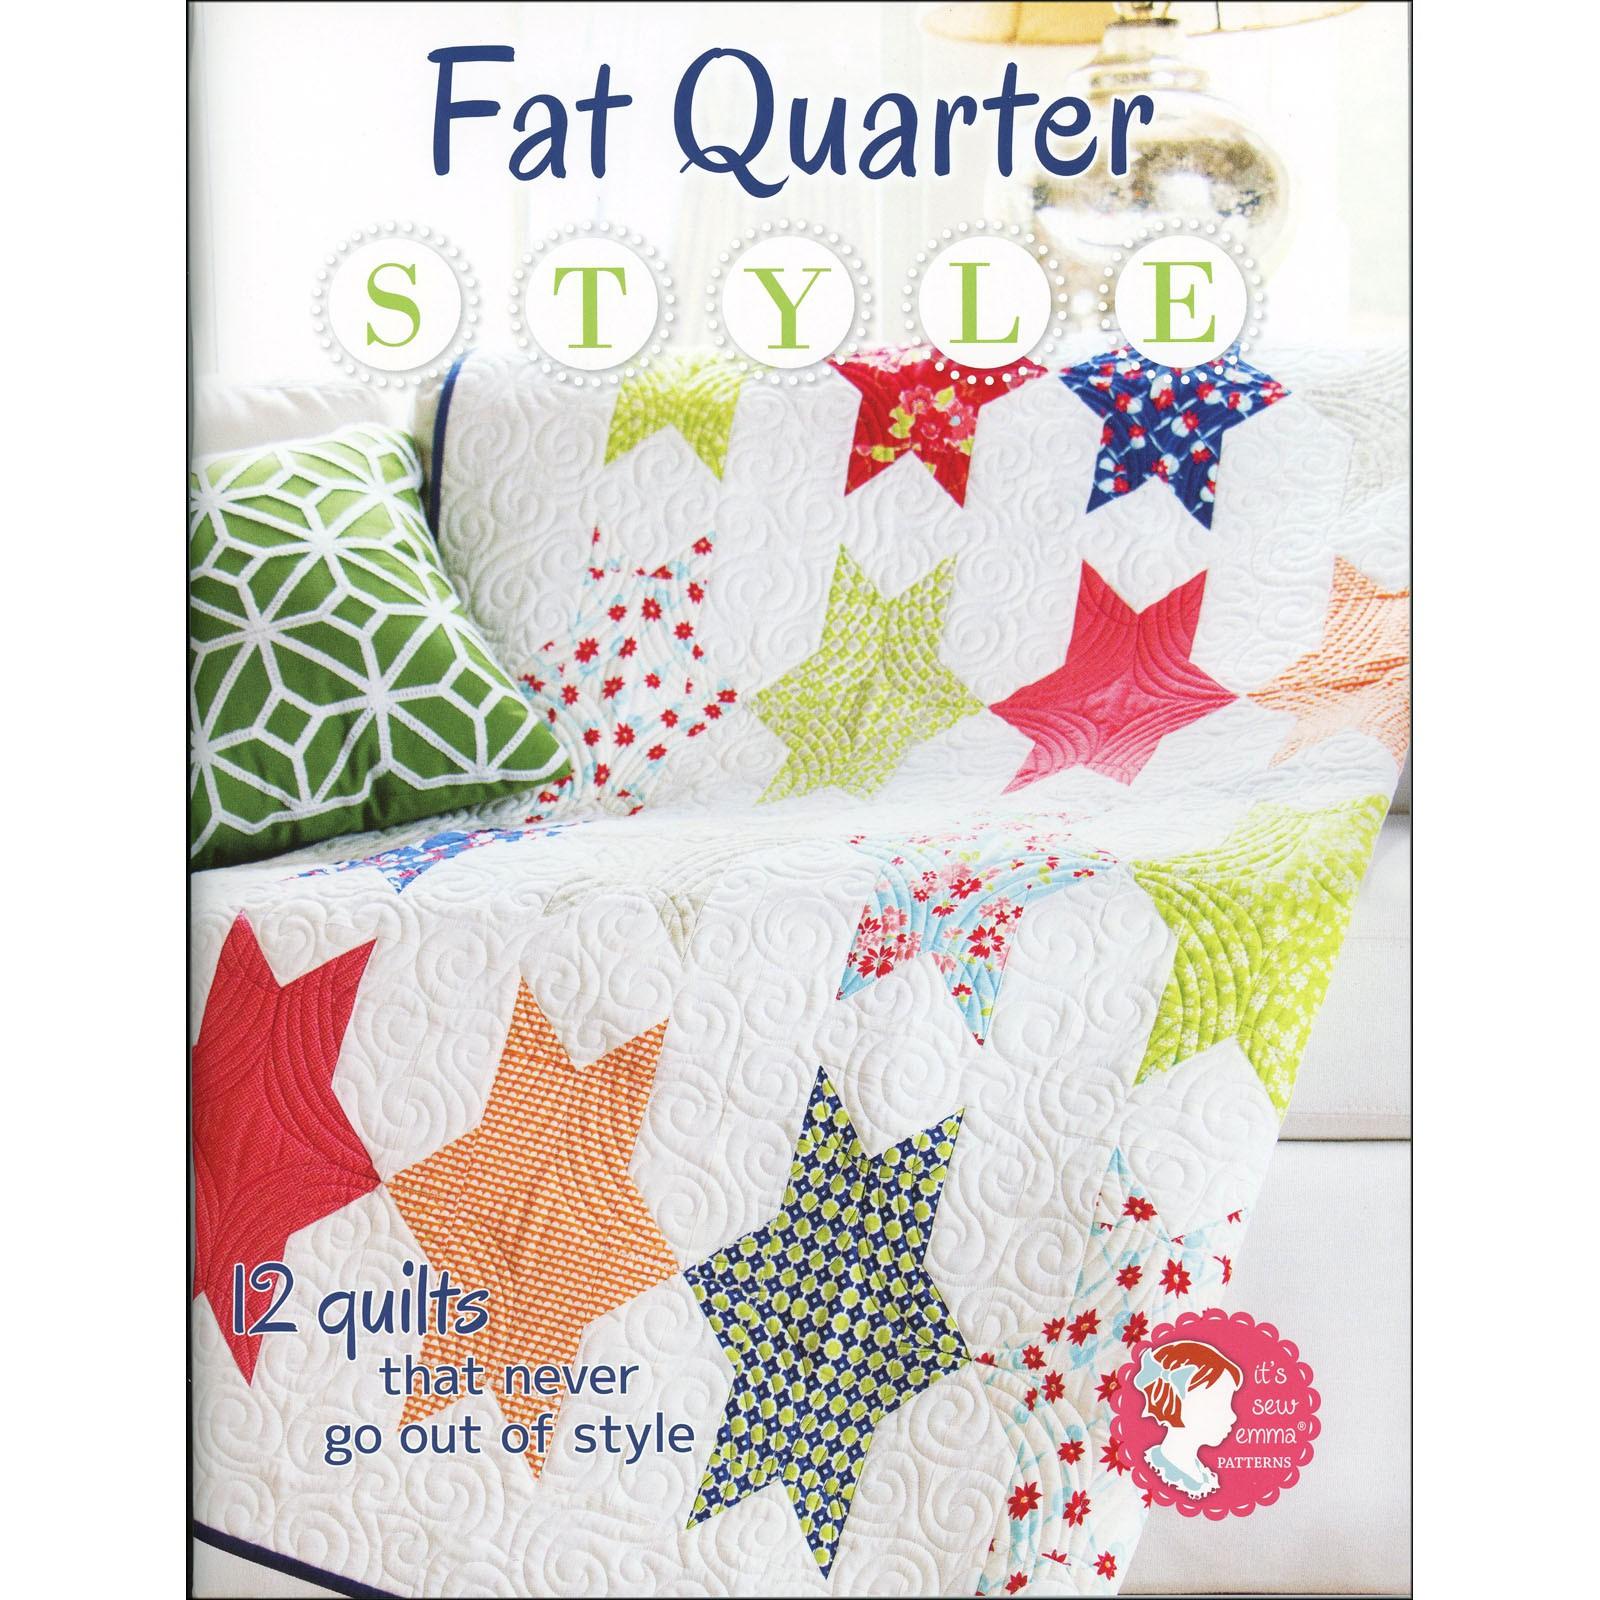 Fat Quarter Style<br/>It's Sew Emma